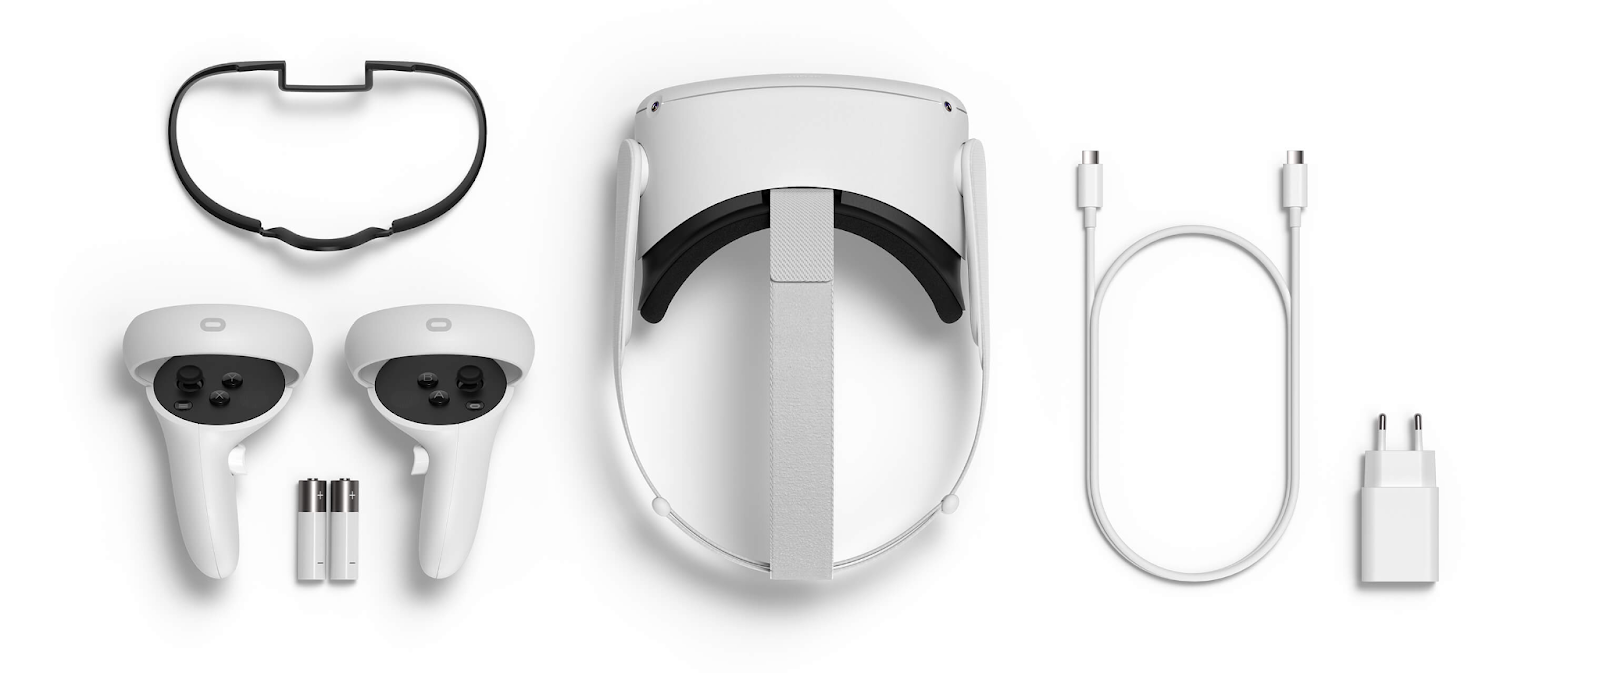 Manettes et casque VR